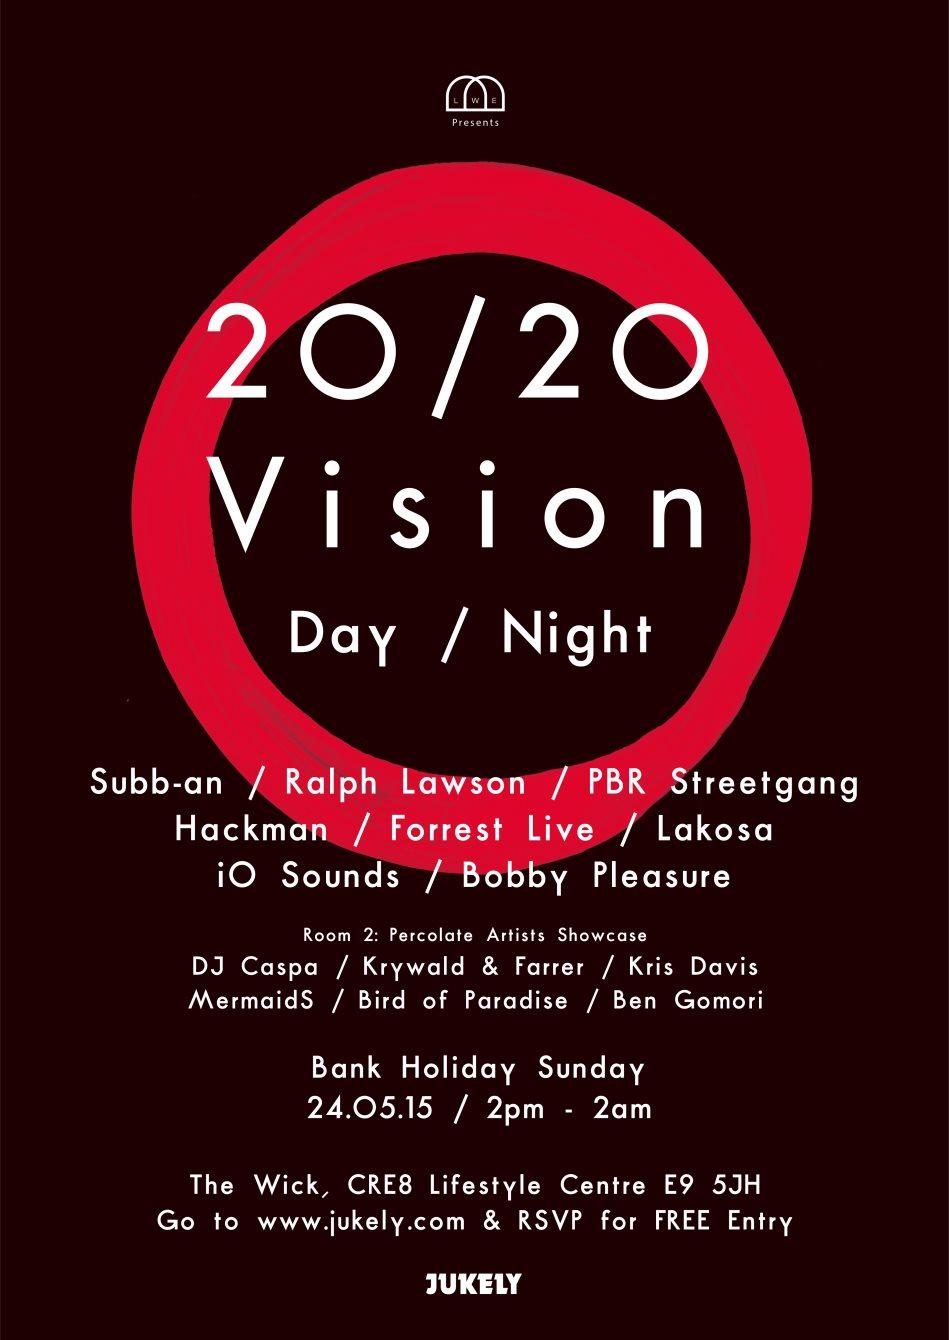 RA: LWE presents: 2020vision Day / Night: Subb-an, Ralph Lawson, PBR